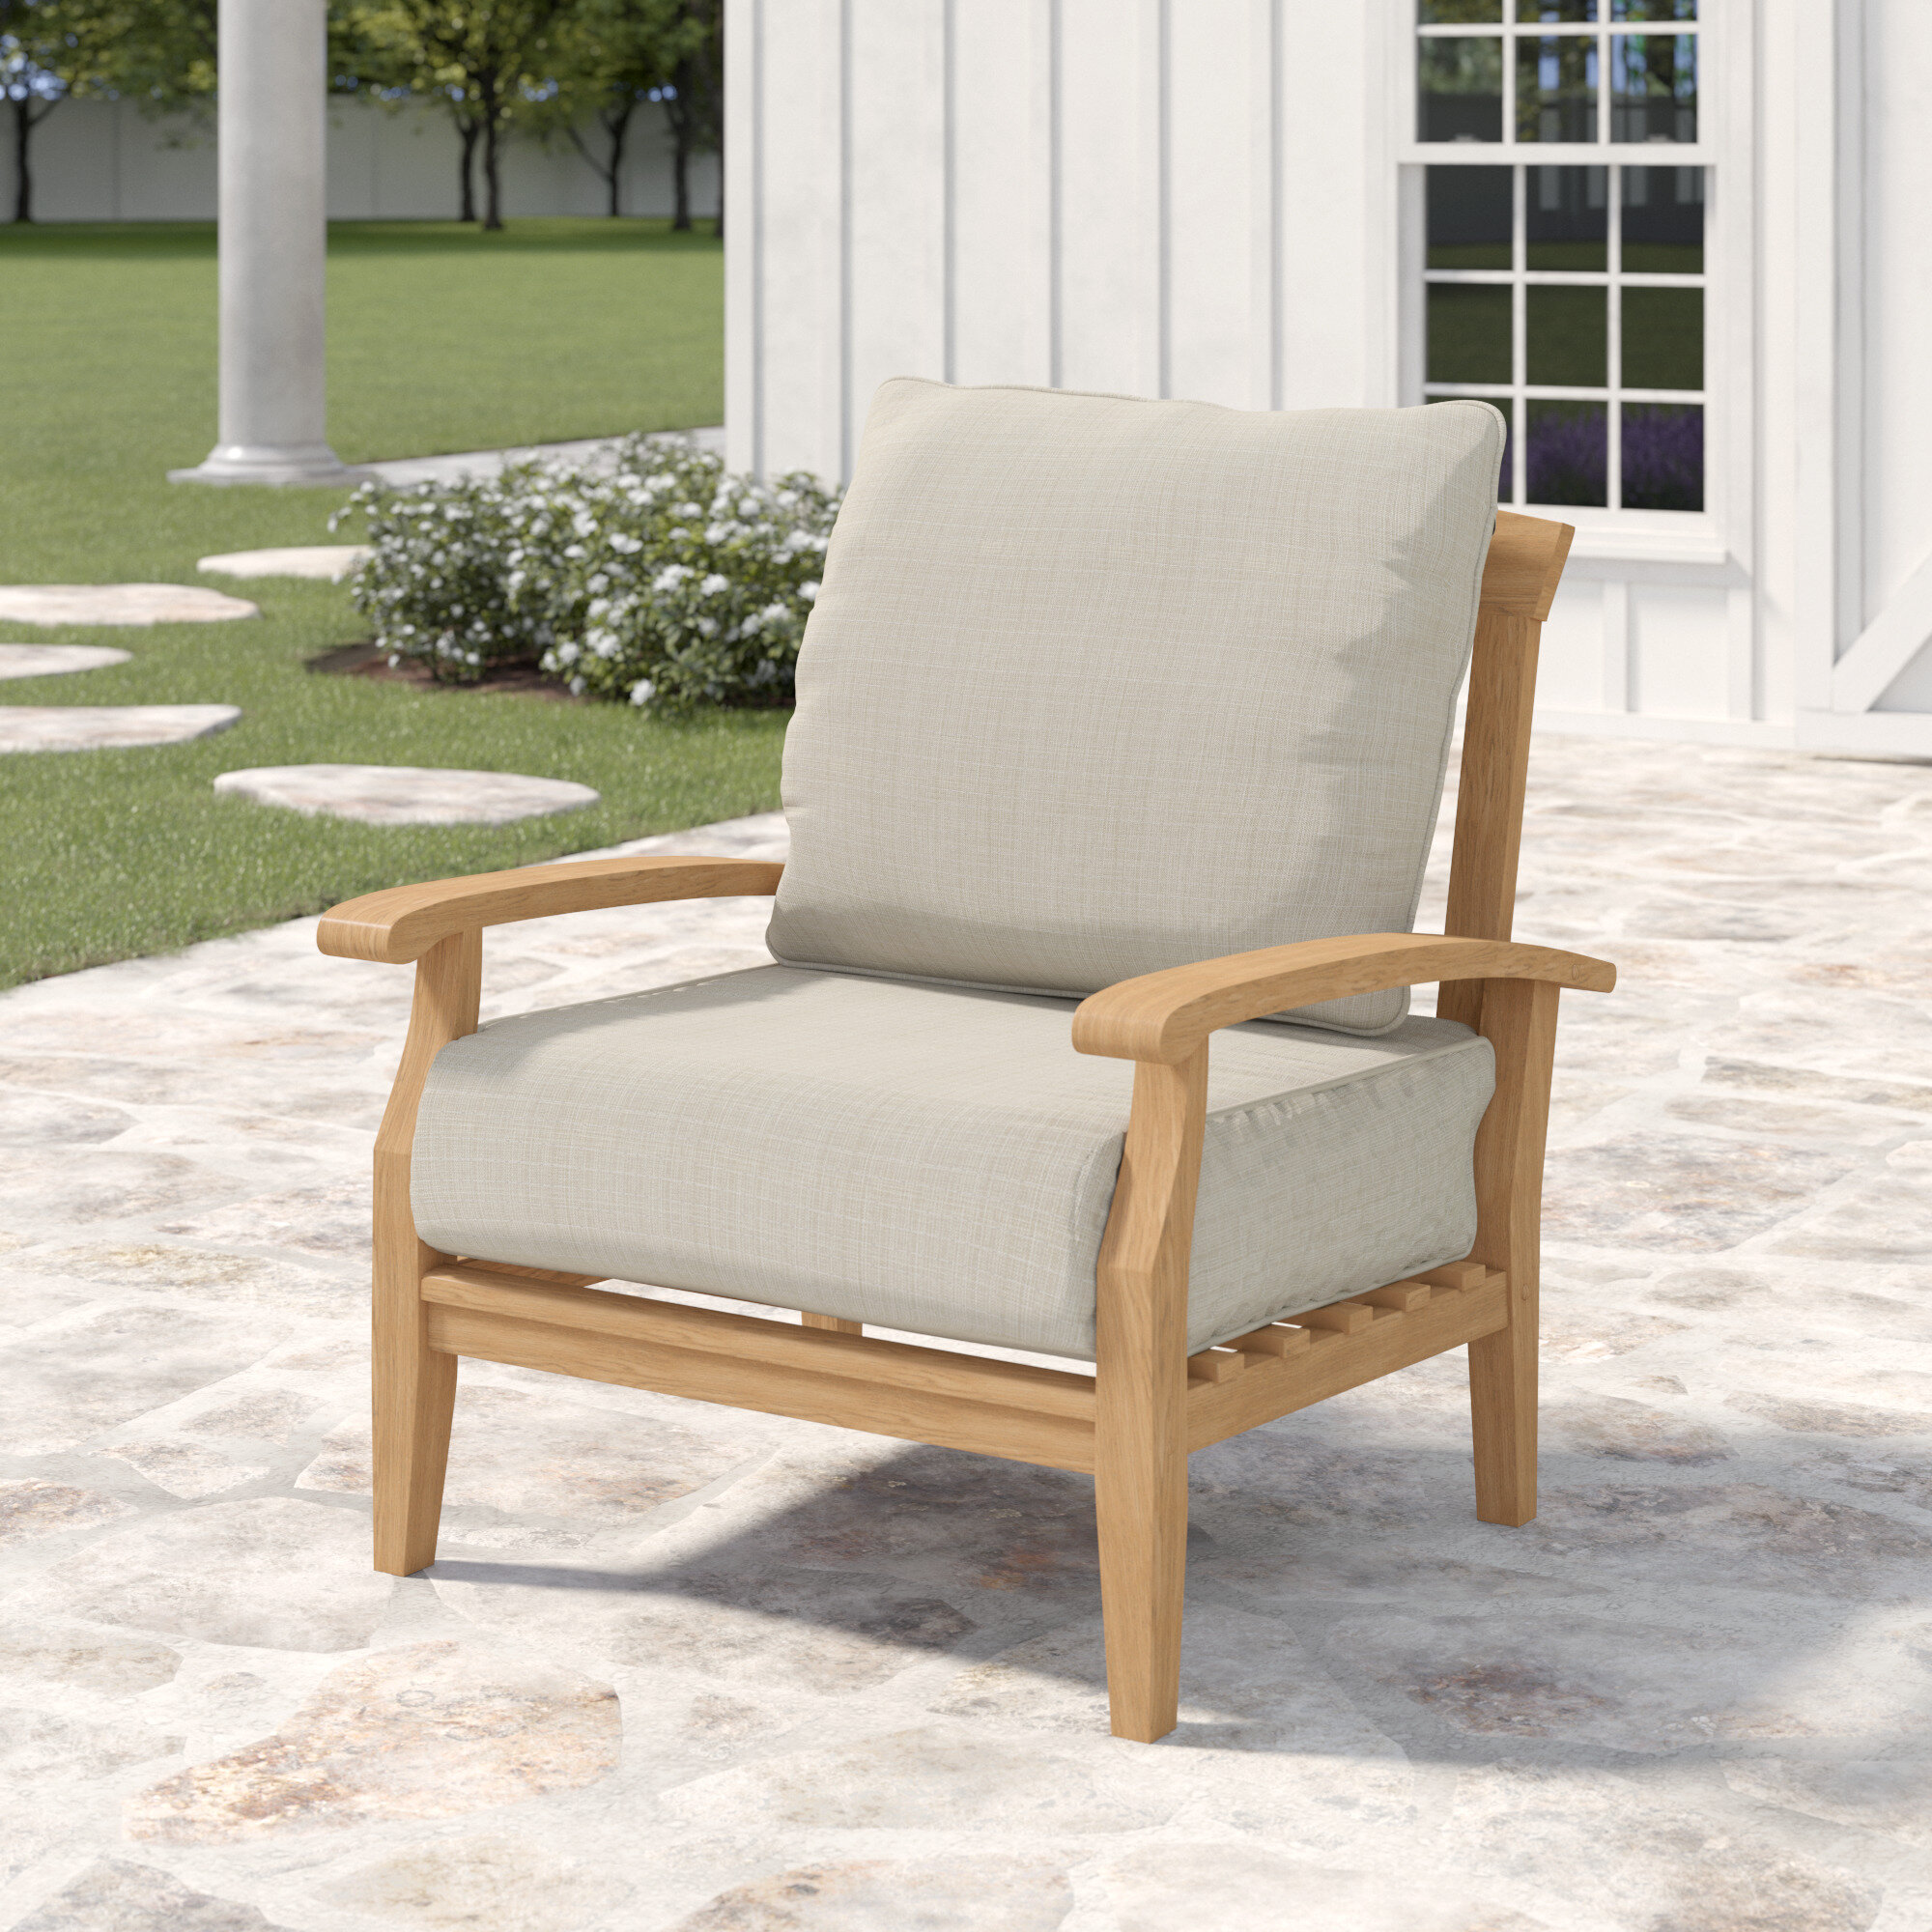 Enjoyable Farmhouse Rustic Teak Outdoor Furniture Birch Lane Home Interior And Landscaping Sapresignezvosmurscom